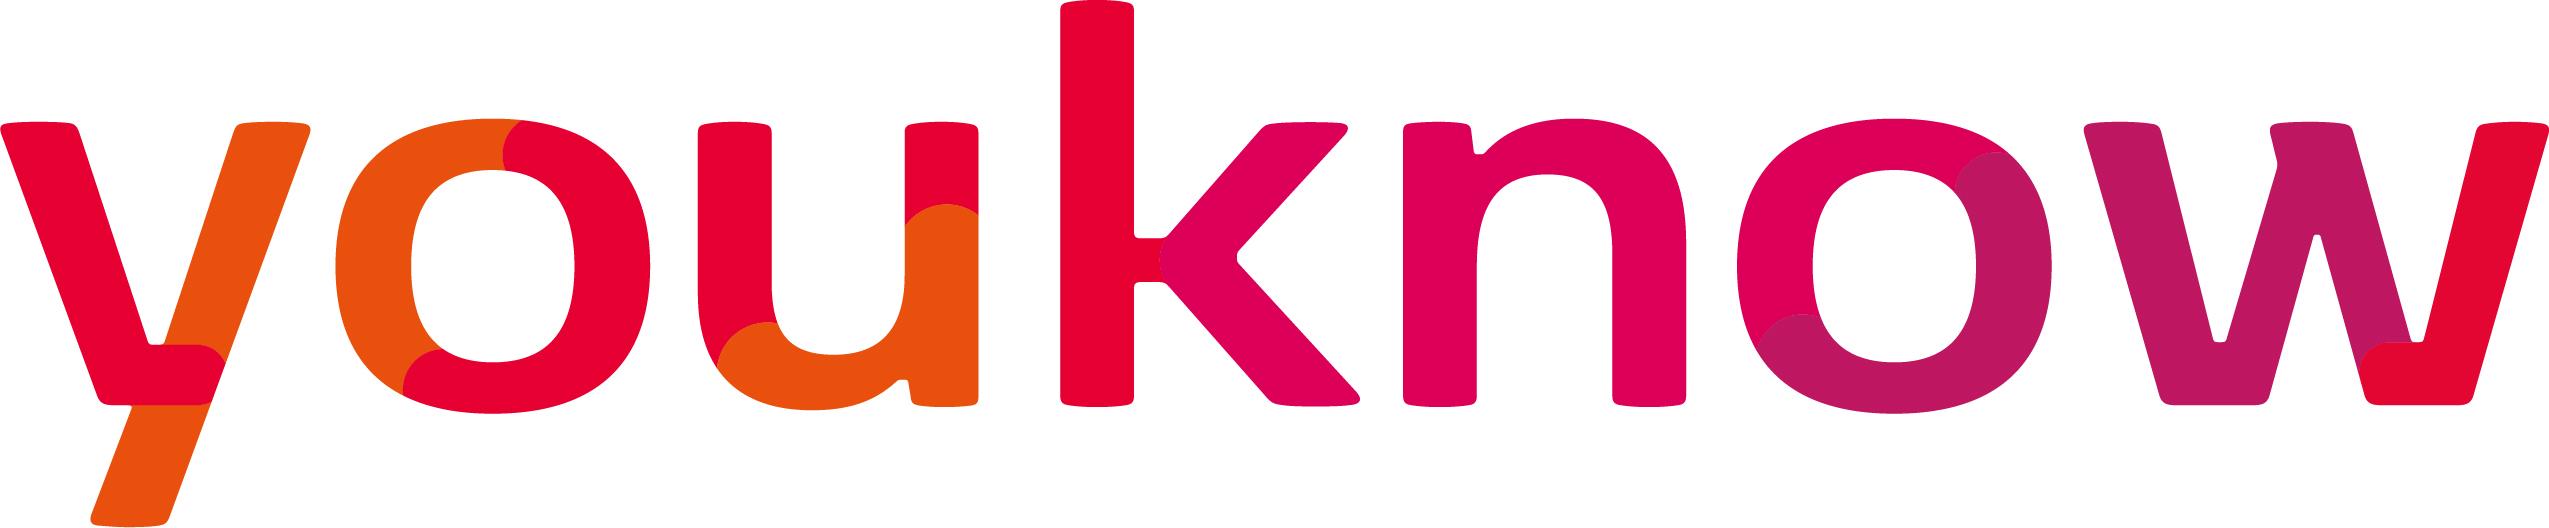 youknow-Logo-Vollfarbig